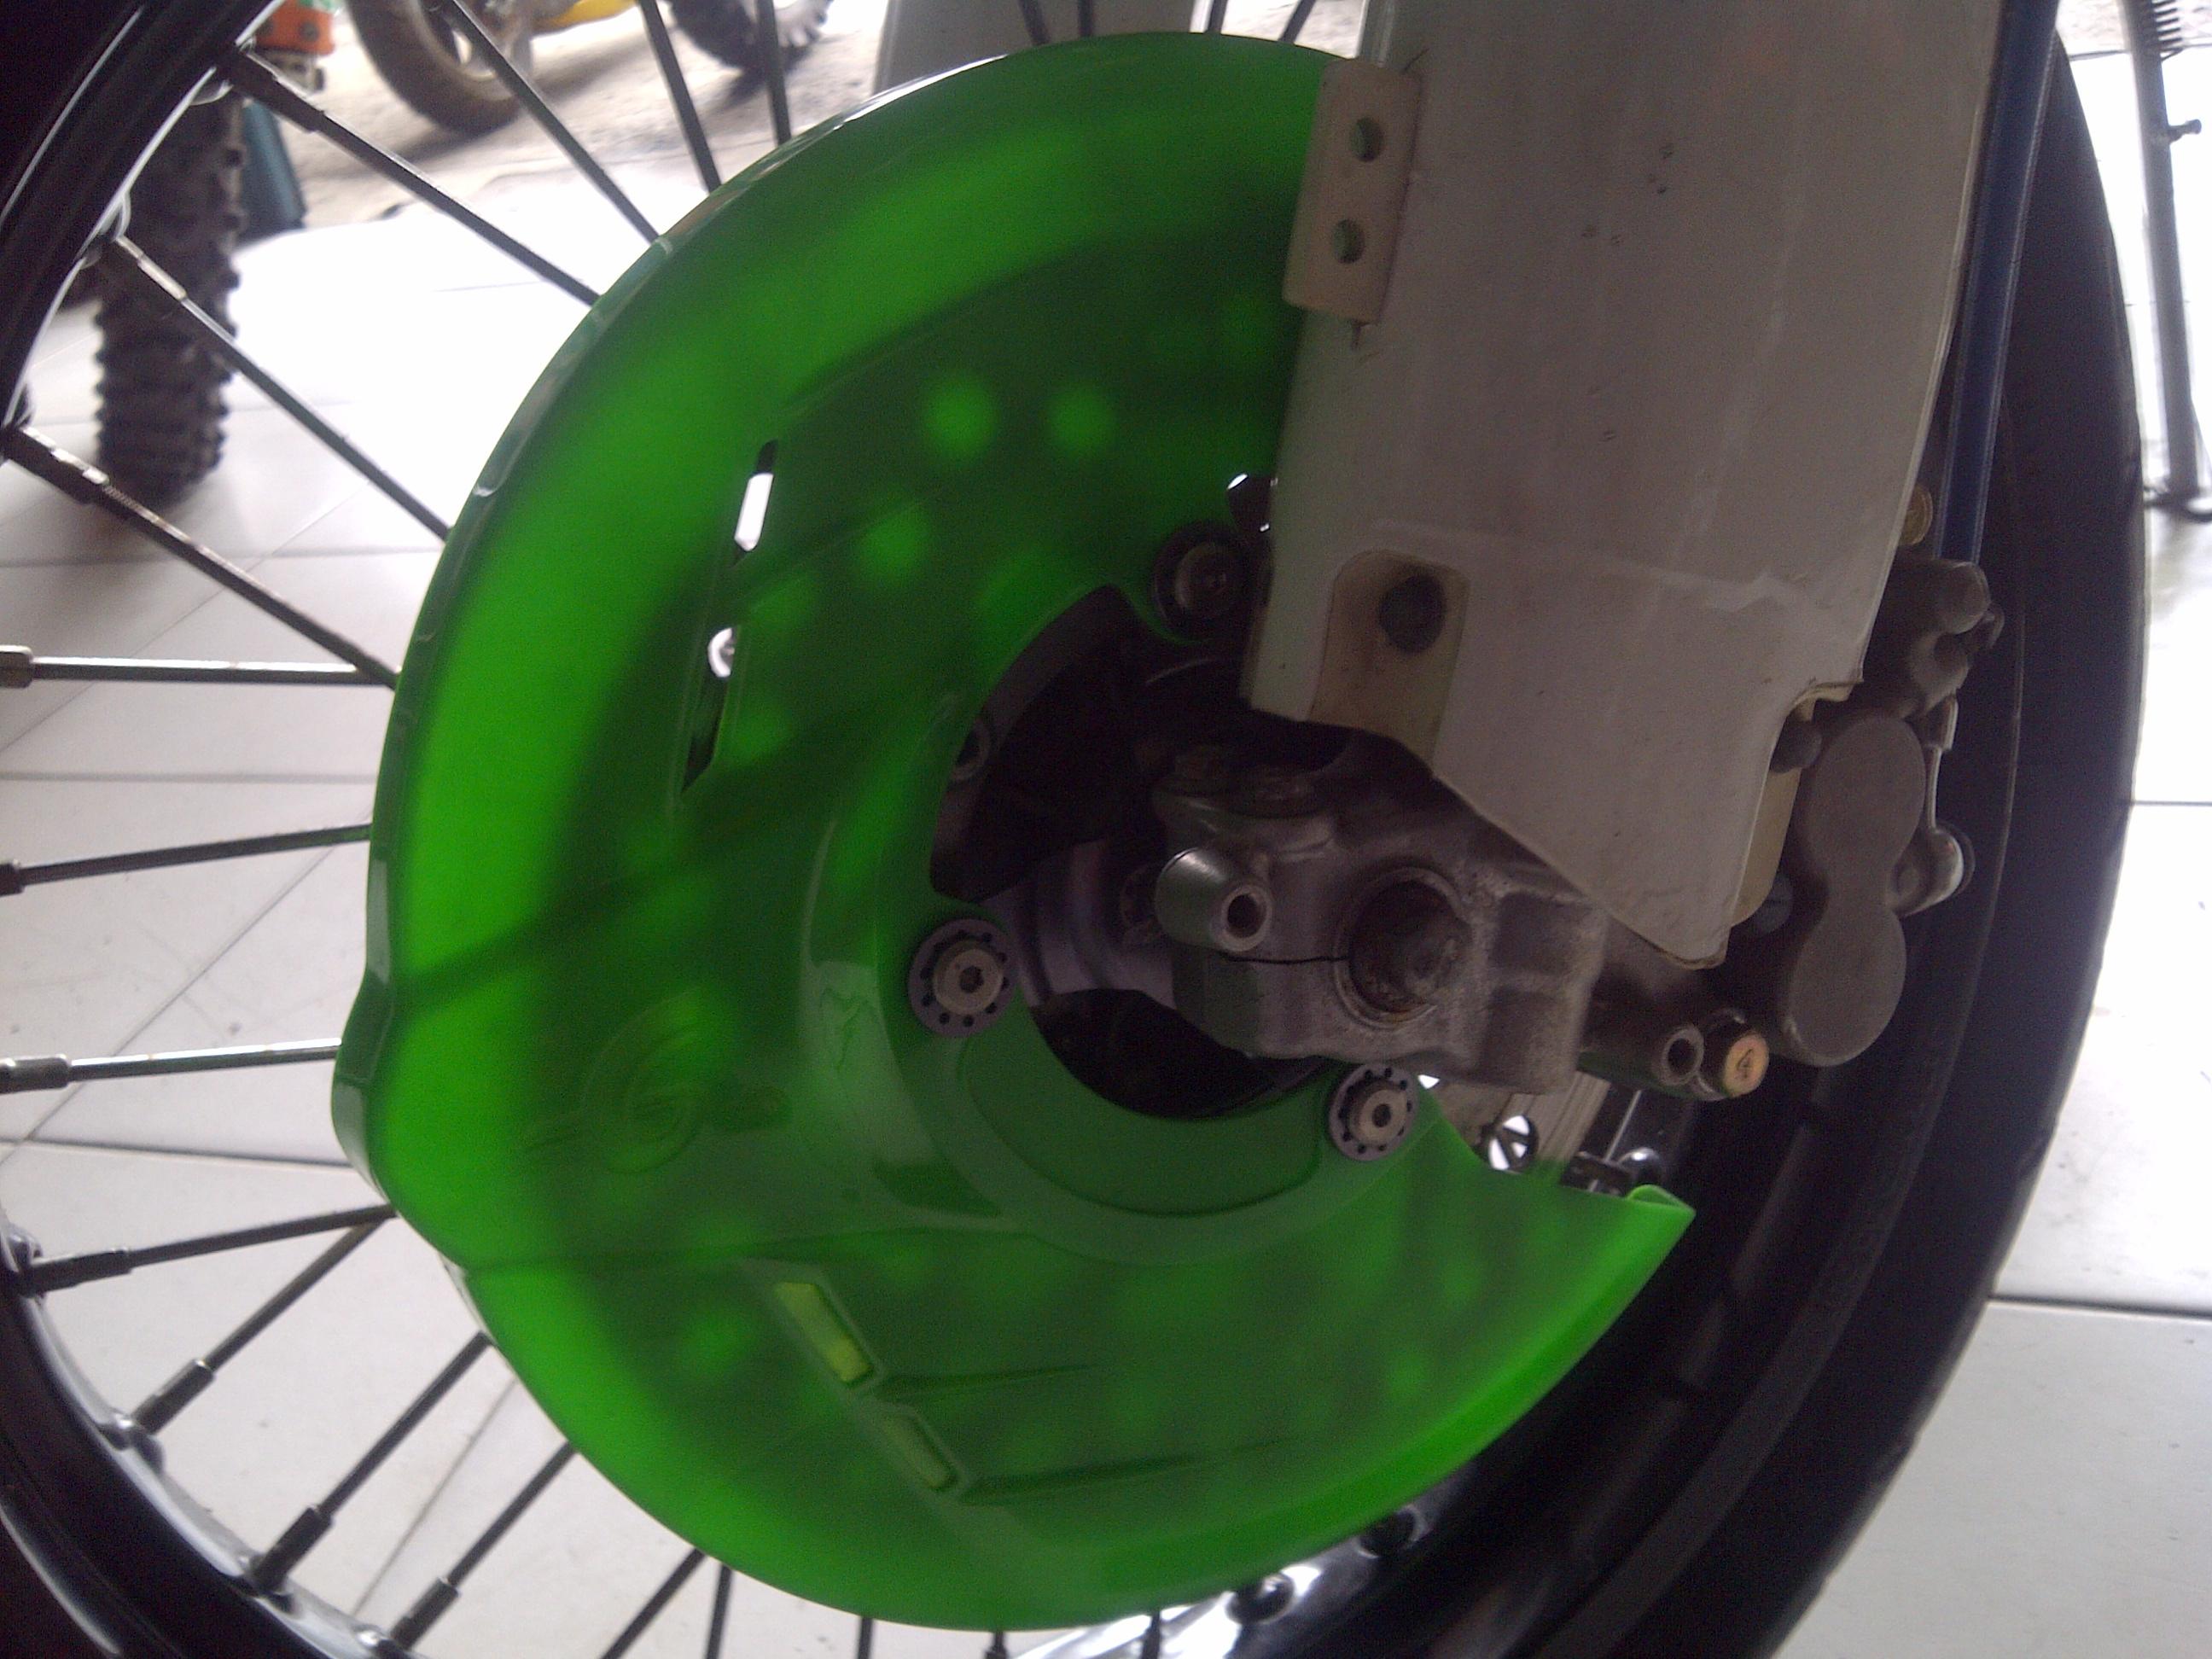 Kebon Jeruk 20130720 00604 Jual disk cover klx 150 wrna hijau,htm,putih